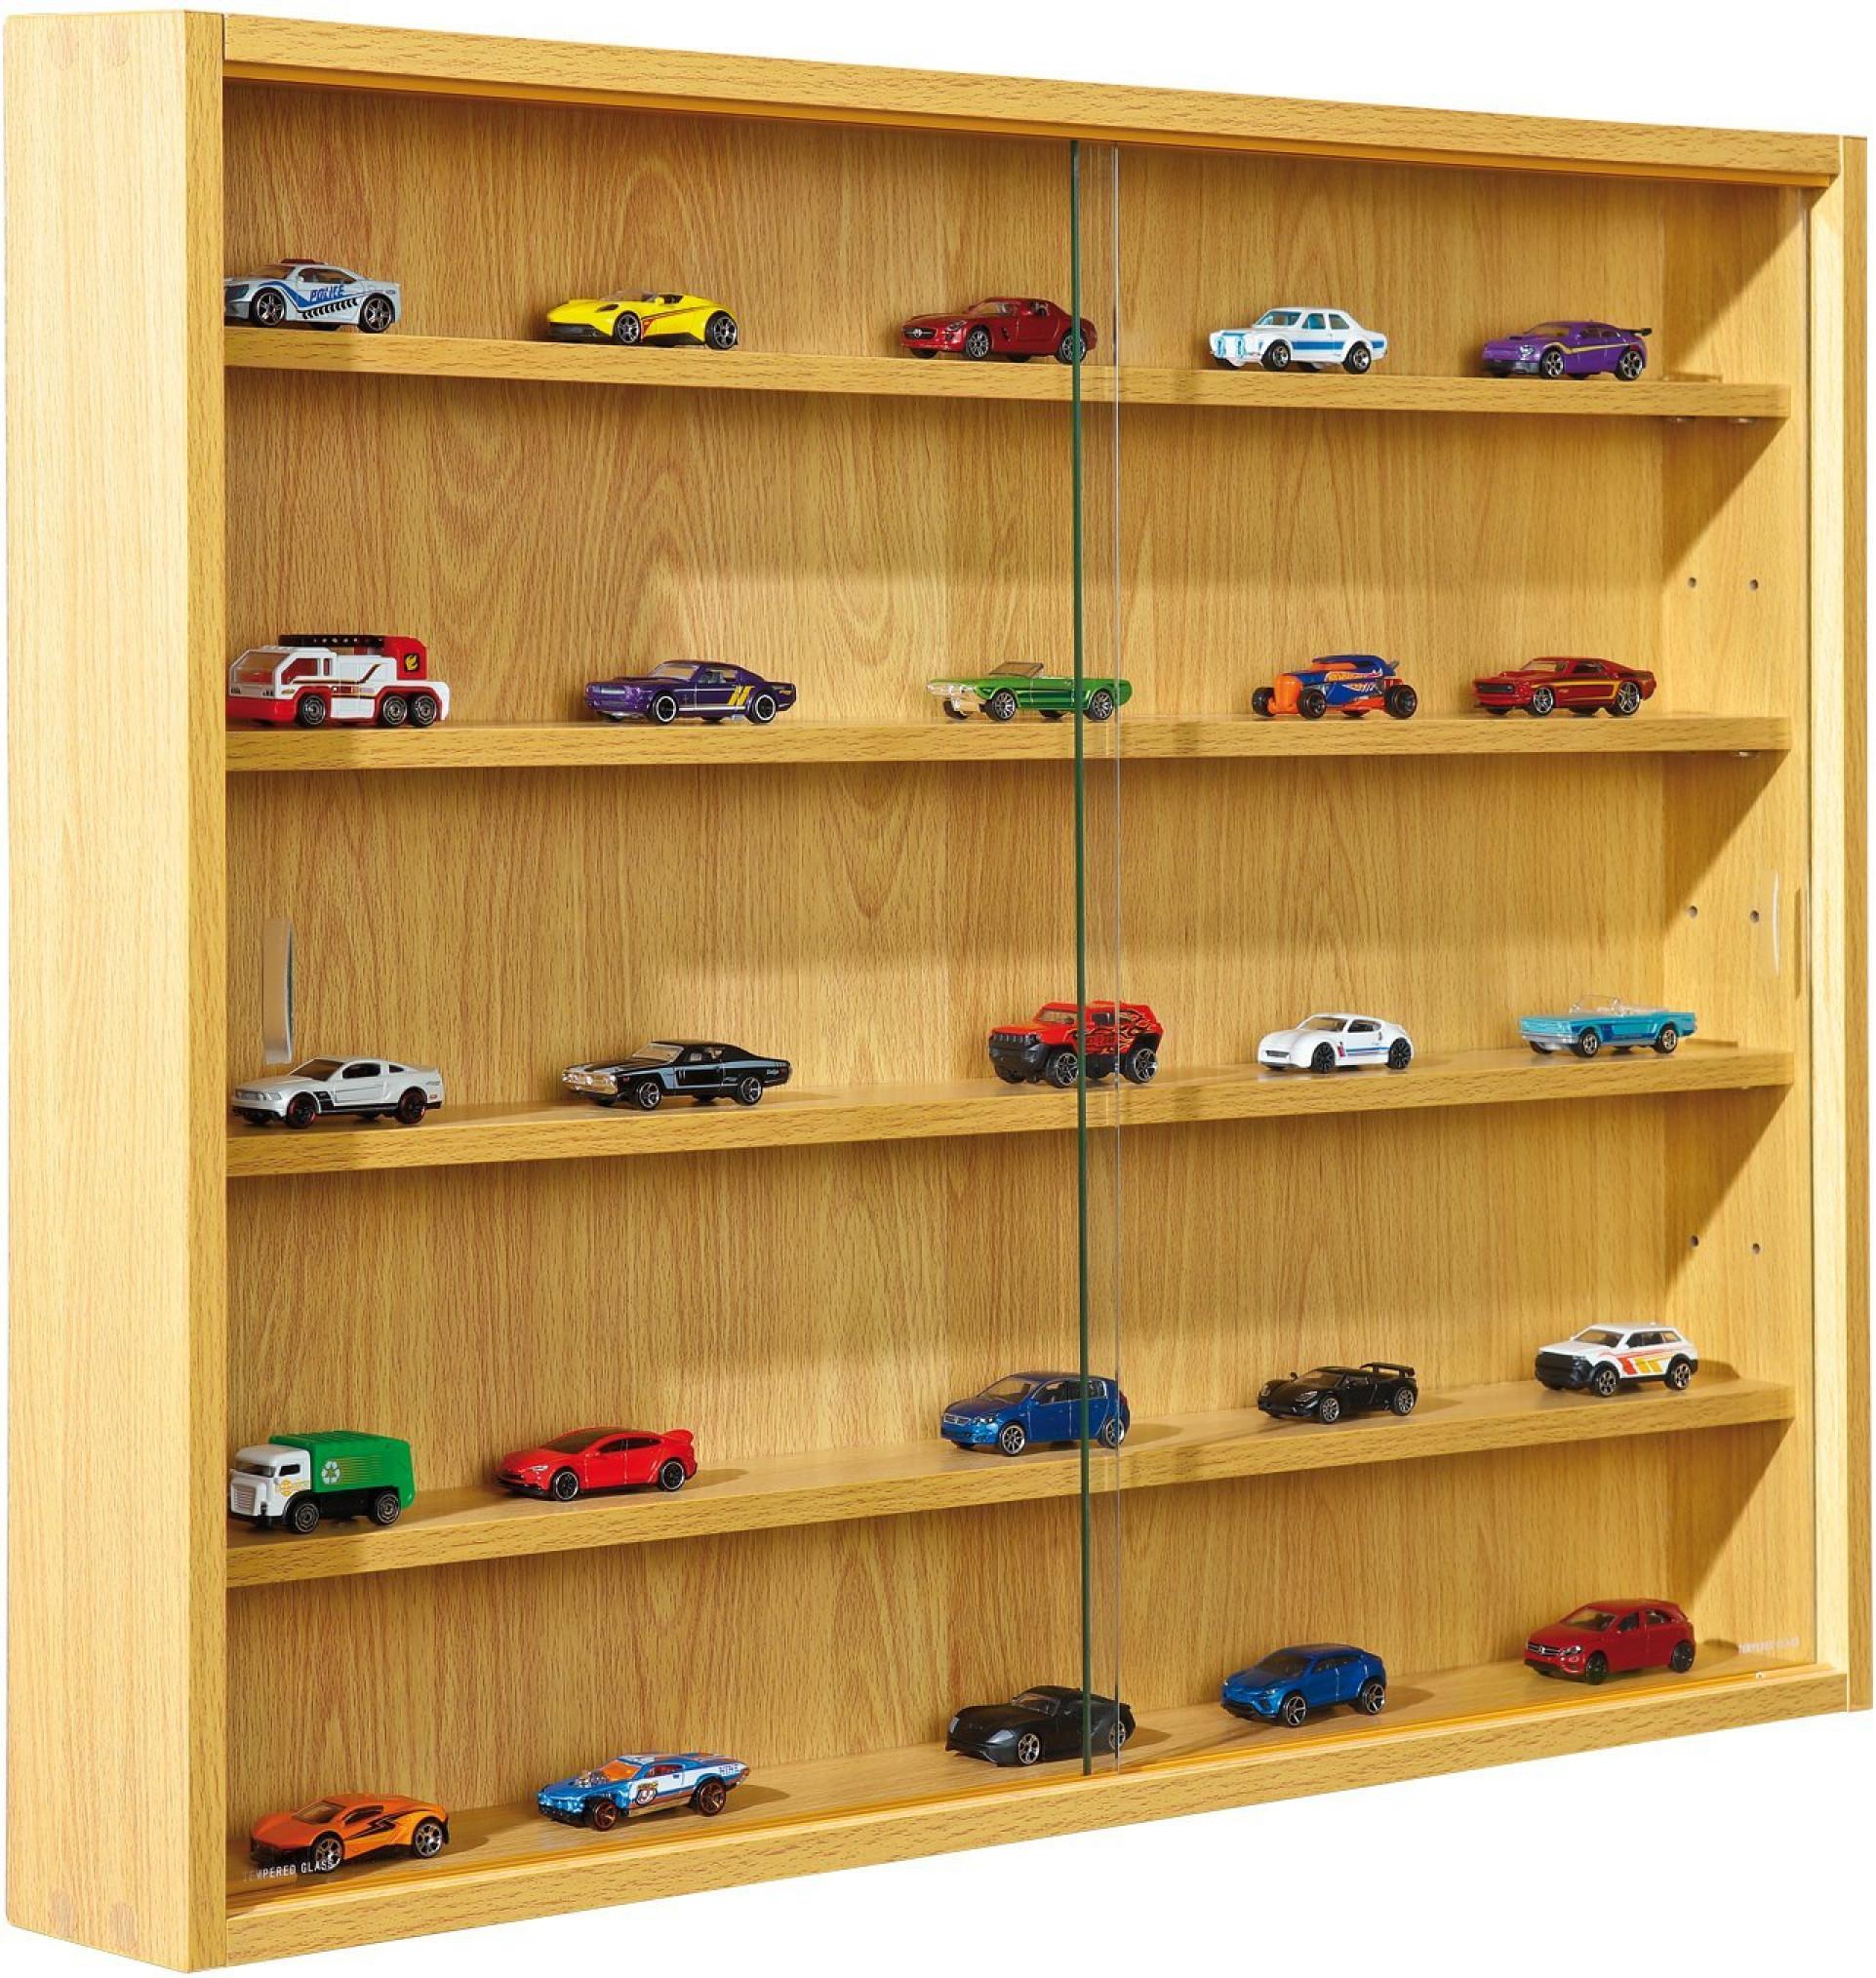 curio collectibles models display cabinet acquario wall. Black Bedroom Furniture Sets. Home Design Ideas